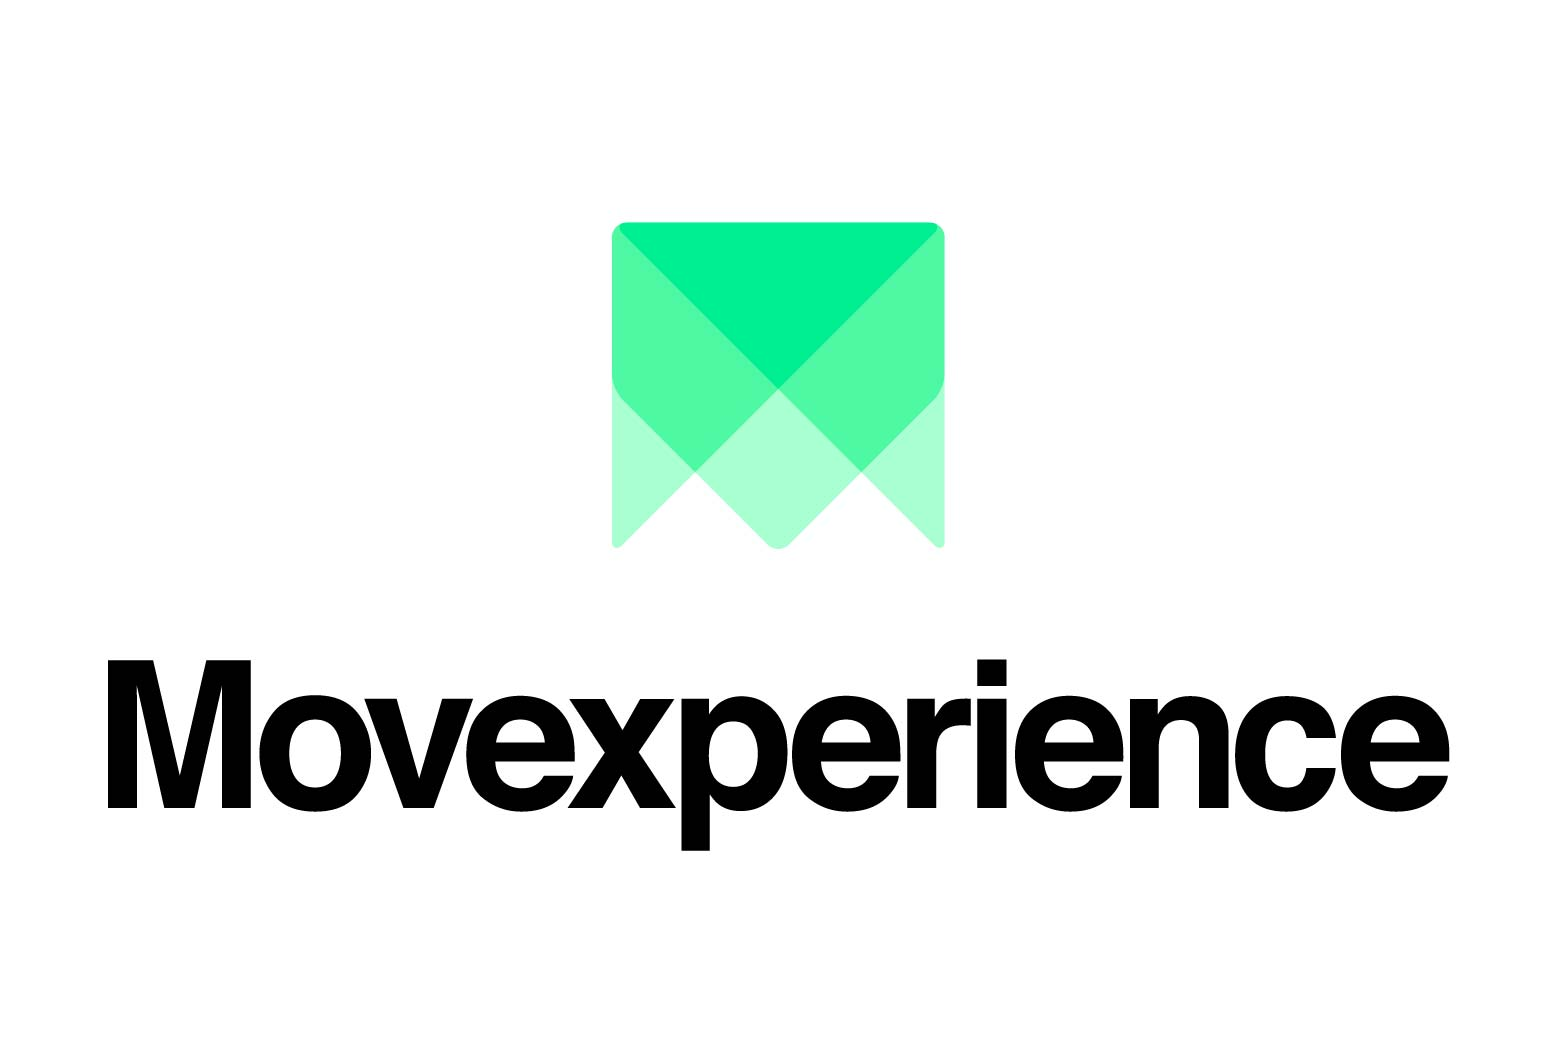 design-administracao-gestao-redes-sociais-criacao-posts-midias-facebook-centro-rj-rio-de-janeiro-movexperience